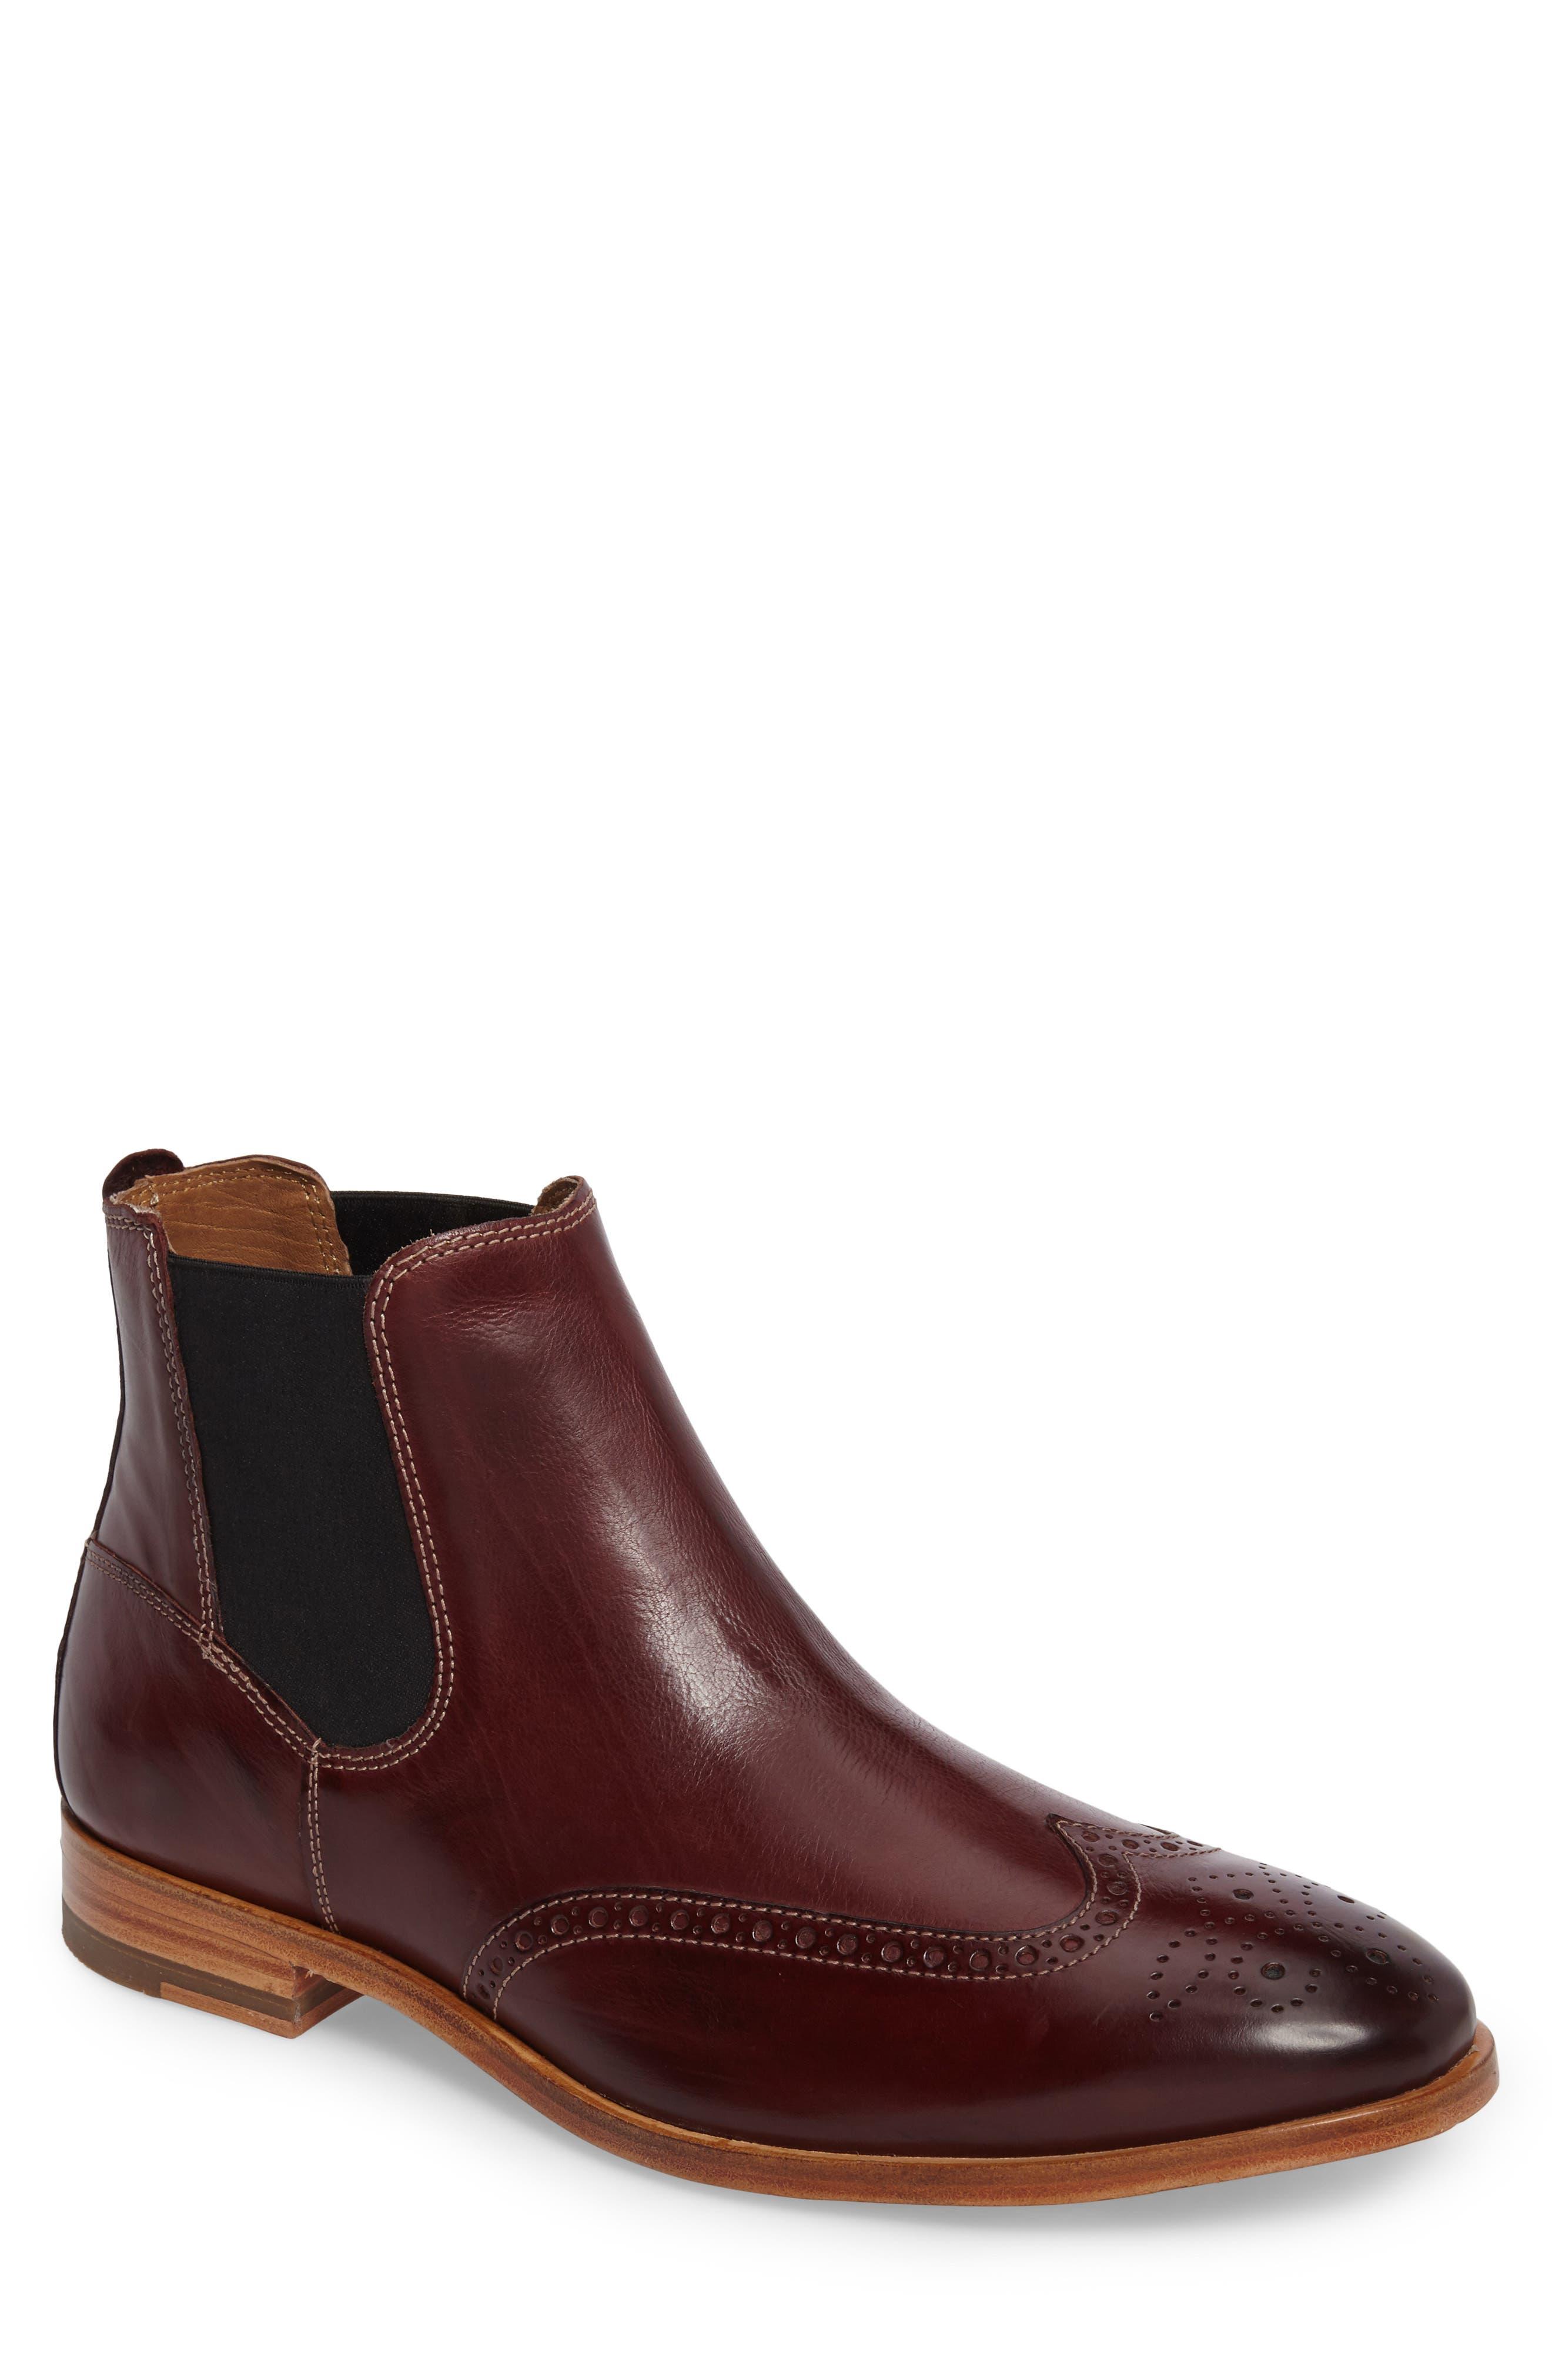 Graham Chelsea Boot,                         Main,                         color, 930